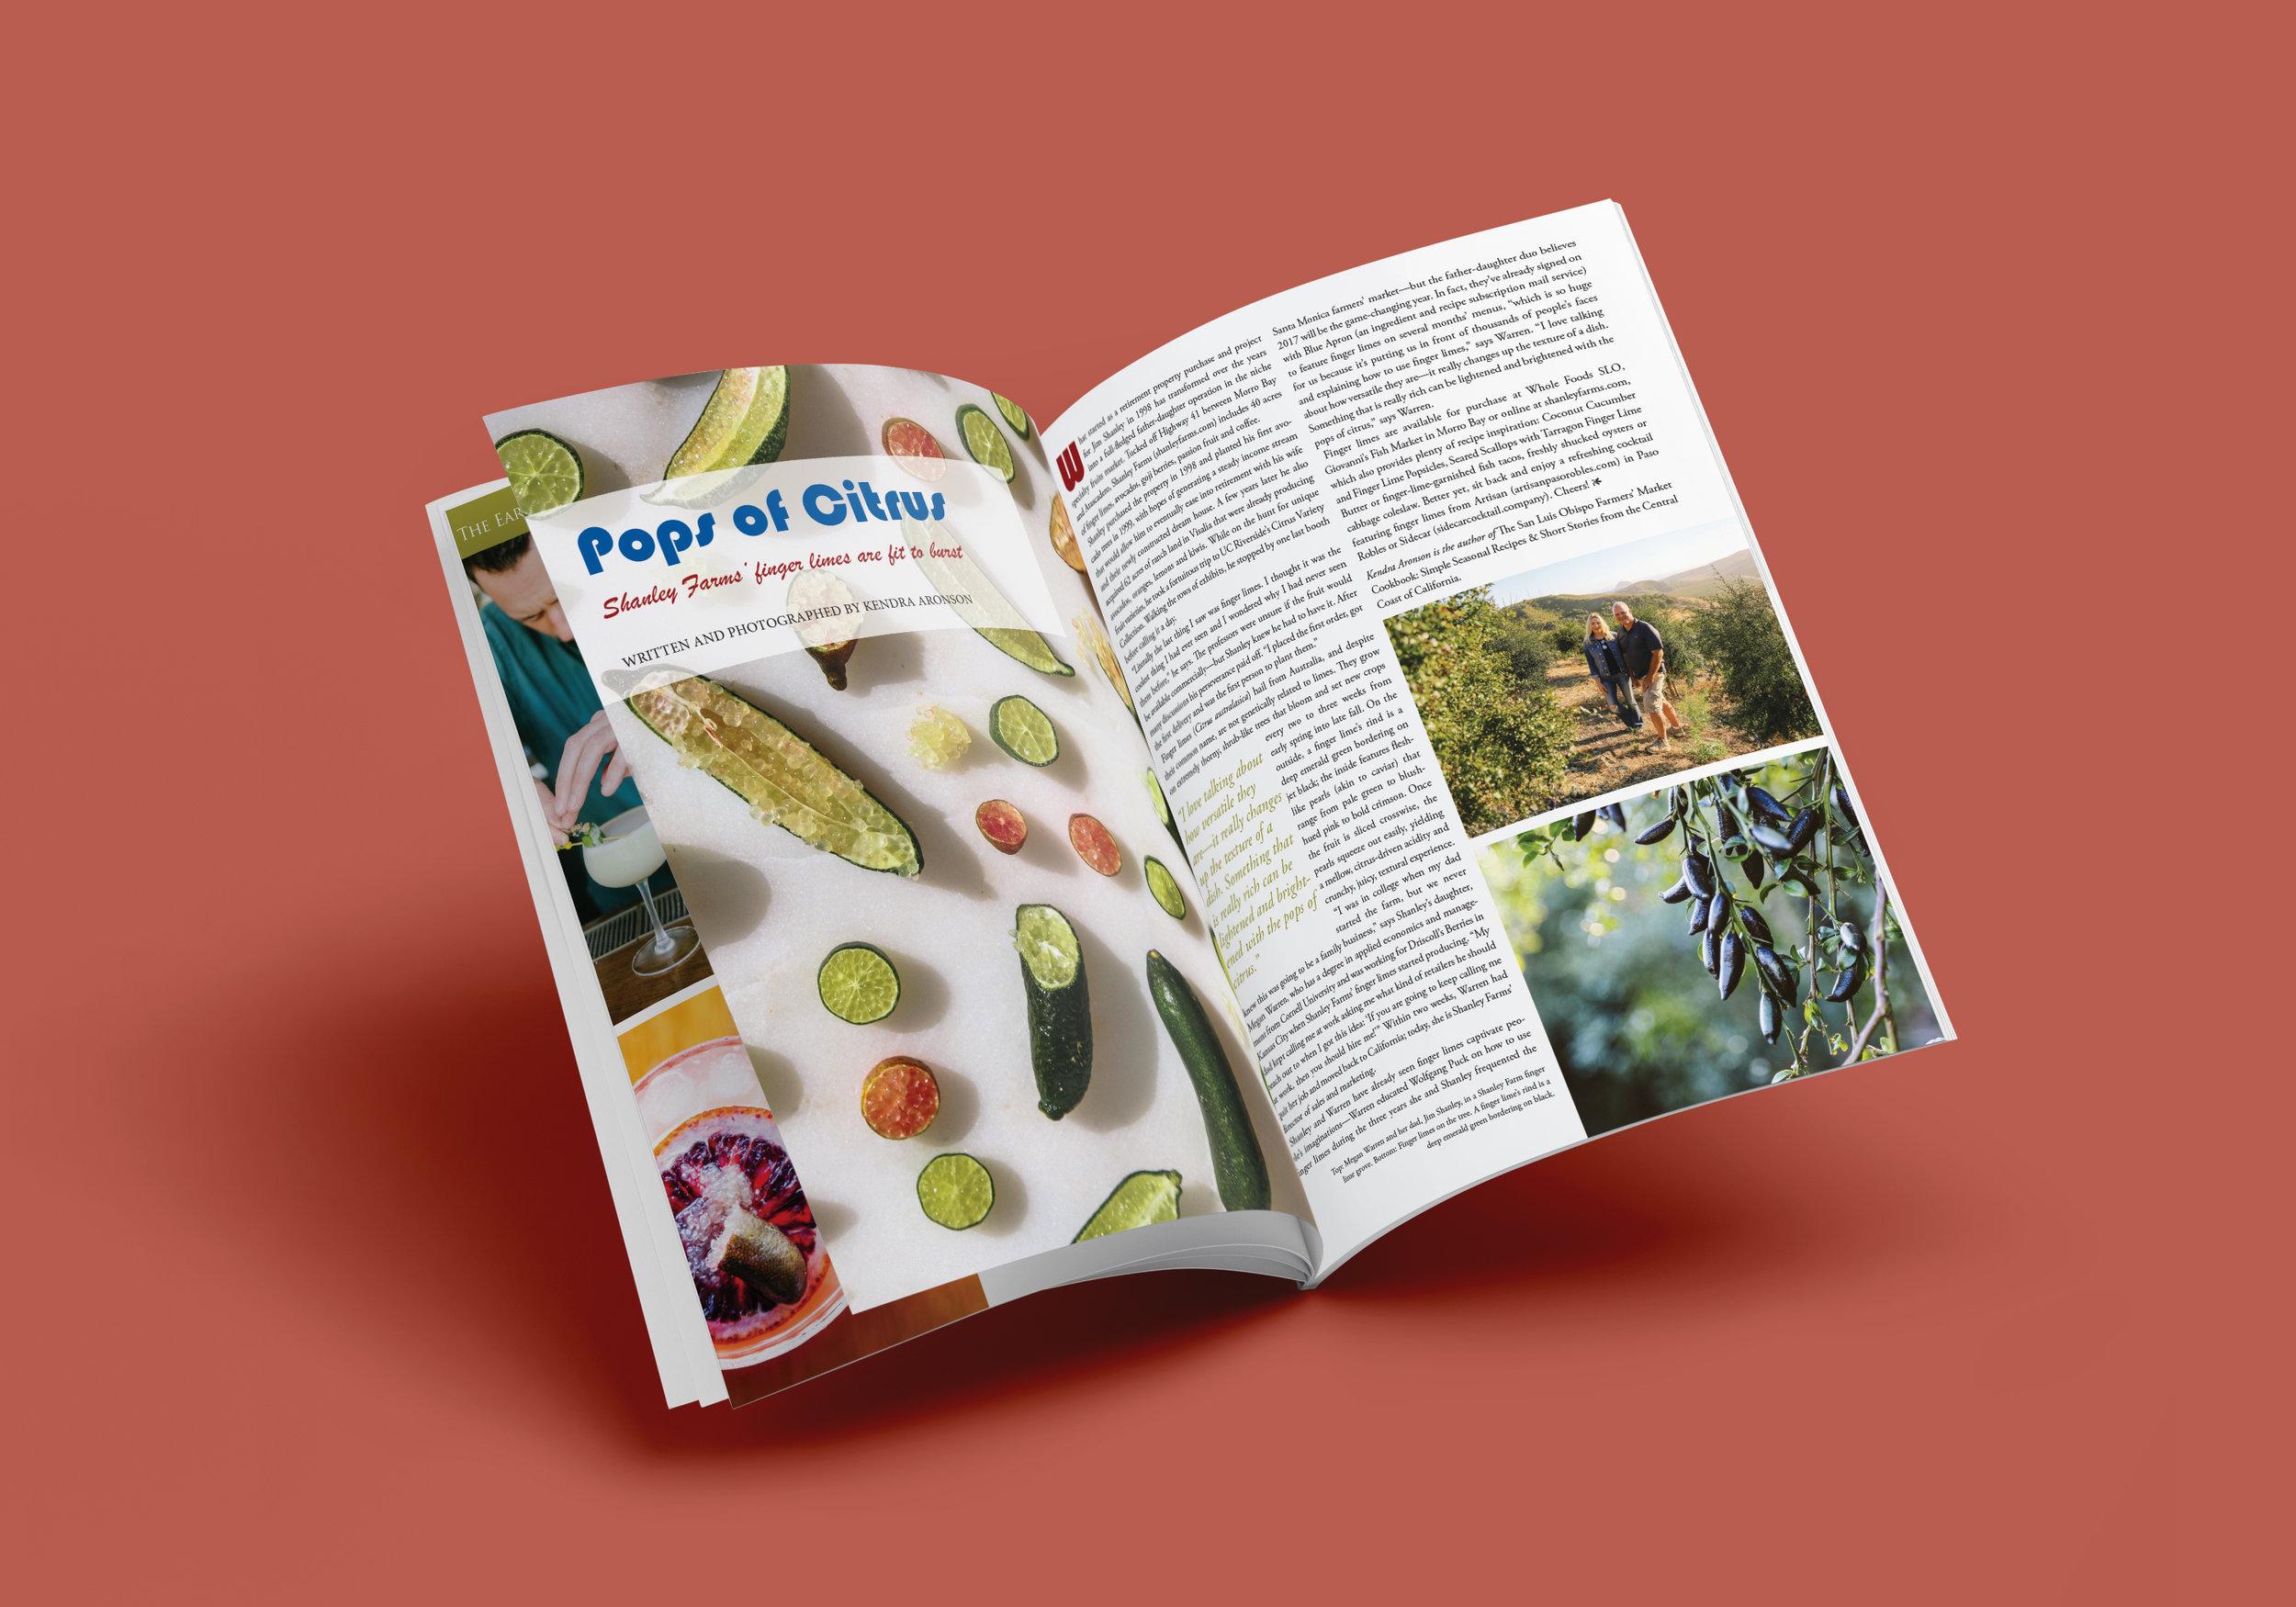 kendra-aronson-edible-finger-limes.jpg